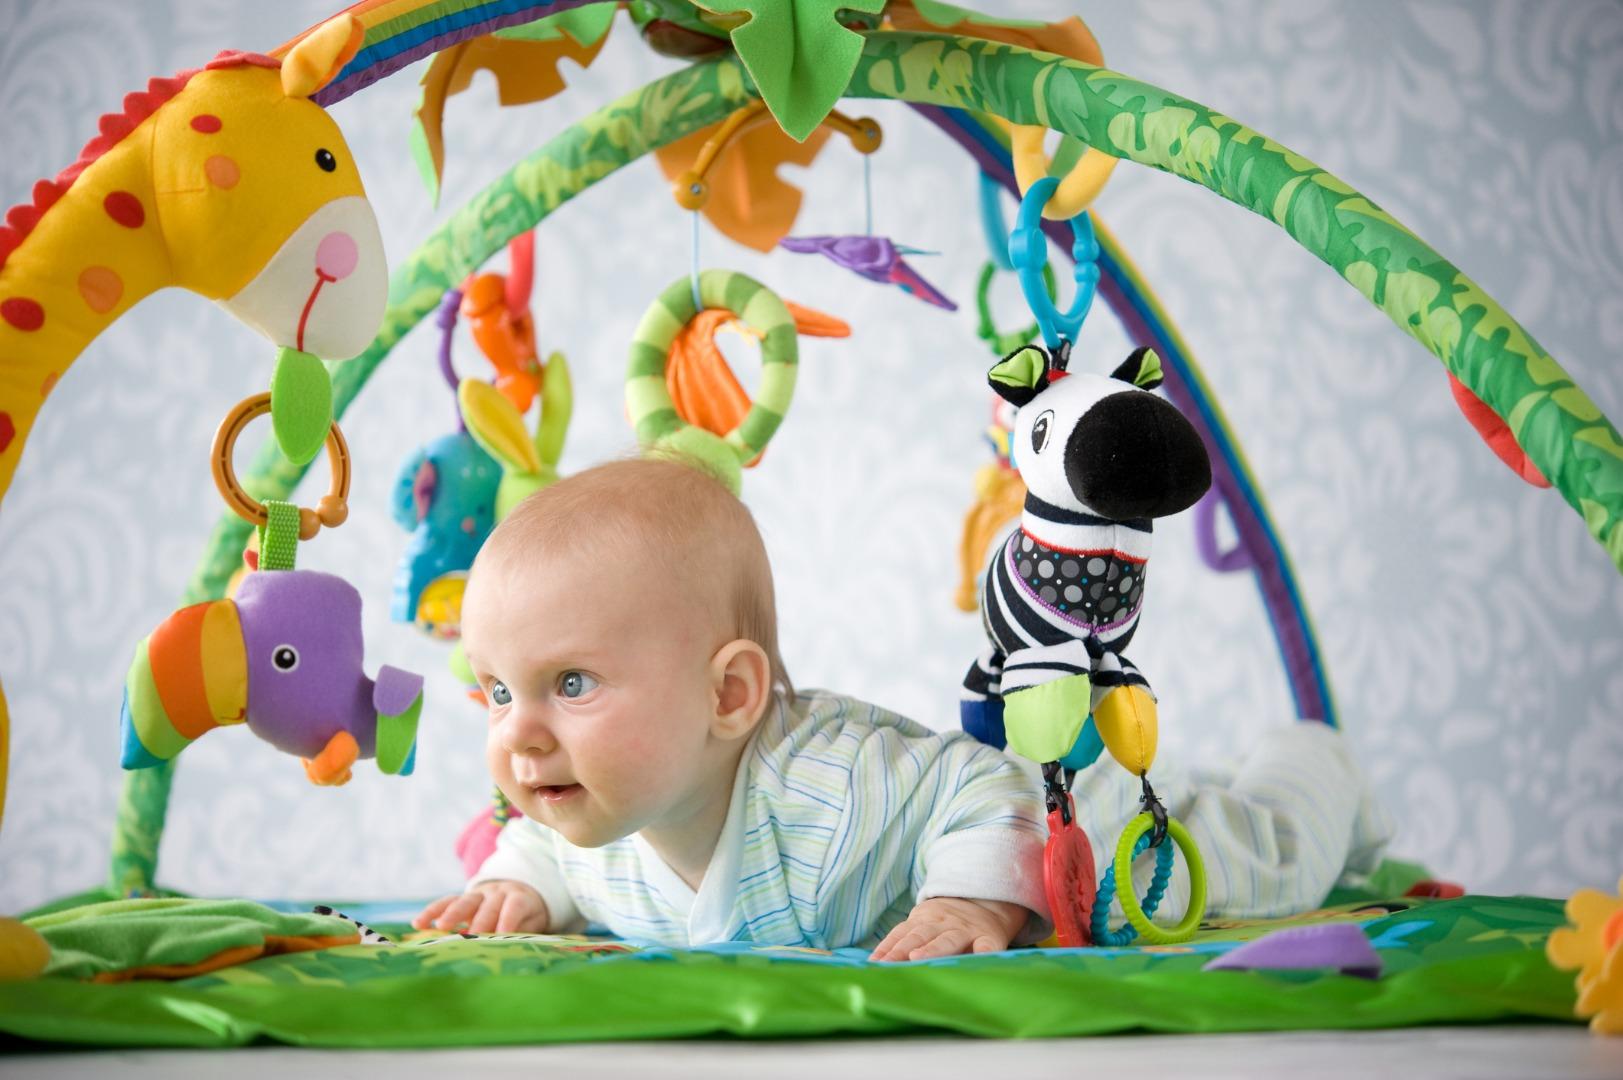 Children's playground for infants